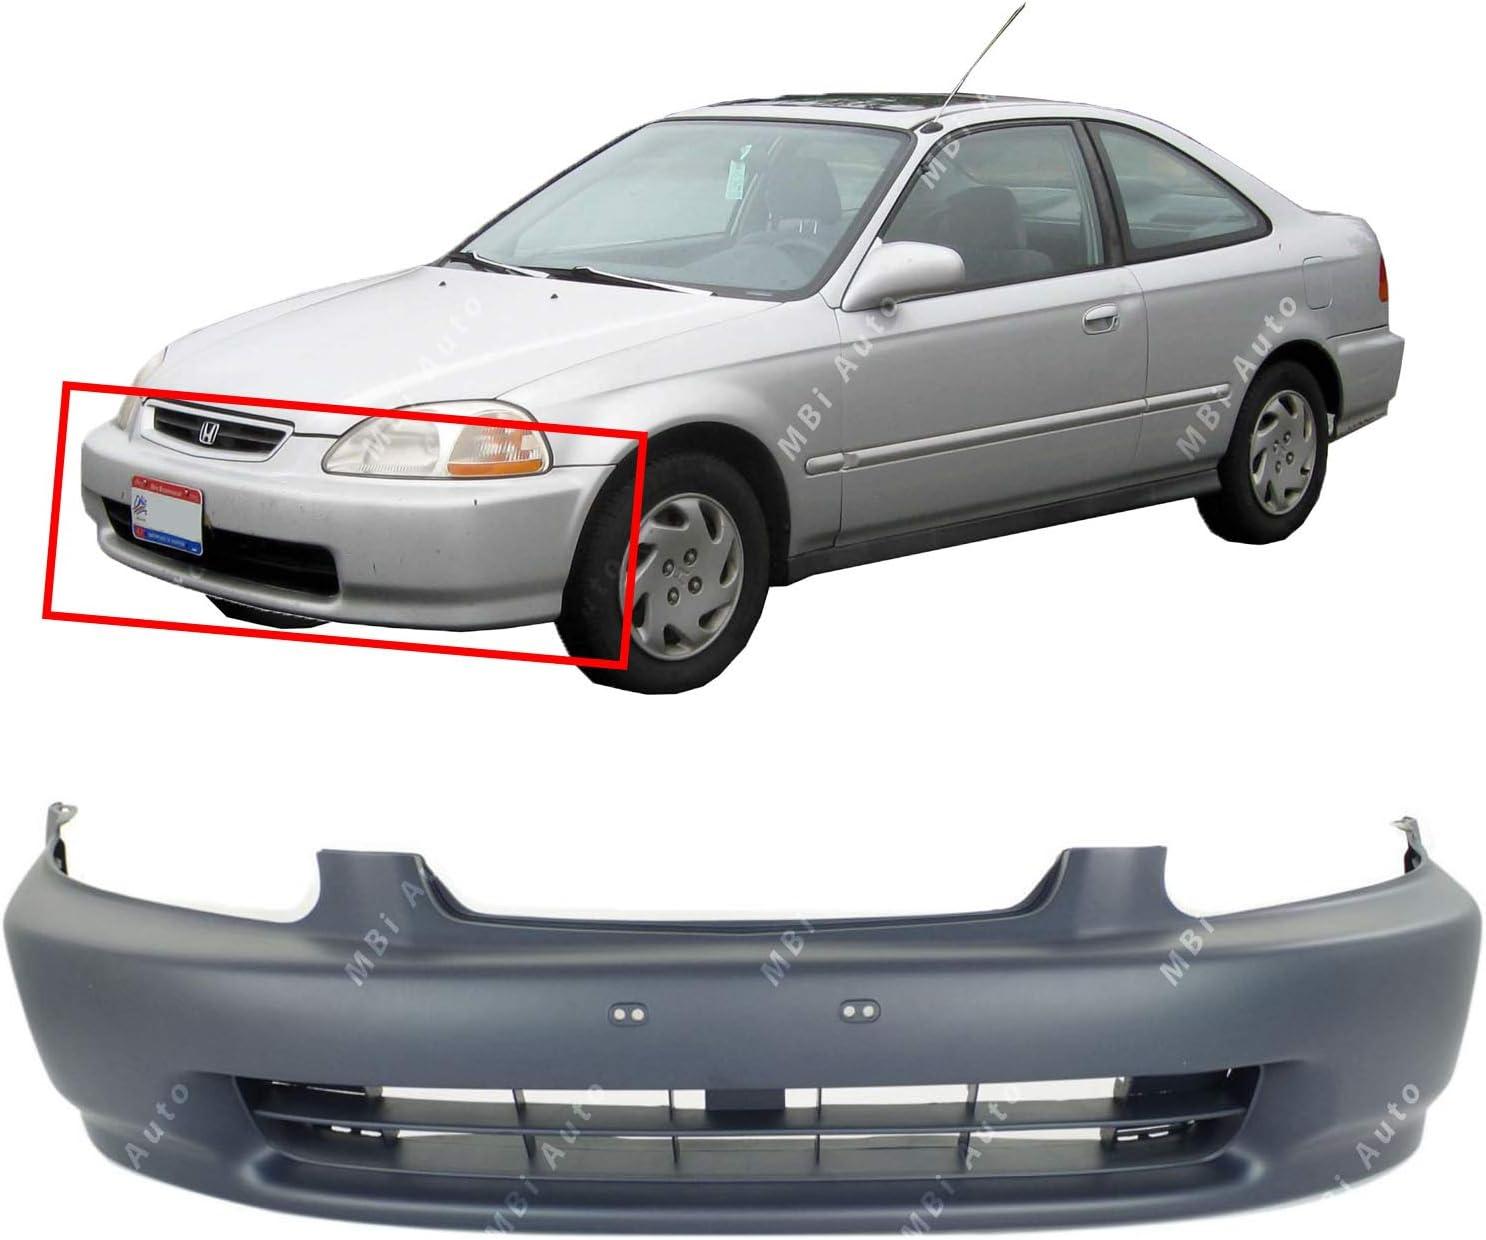 New Auto Body Repair for Honda Civic 1996-1998